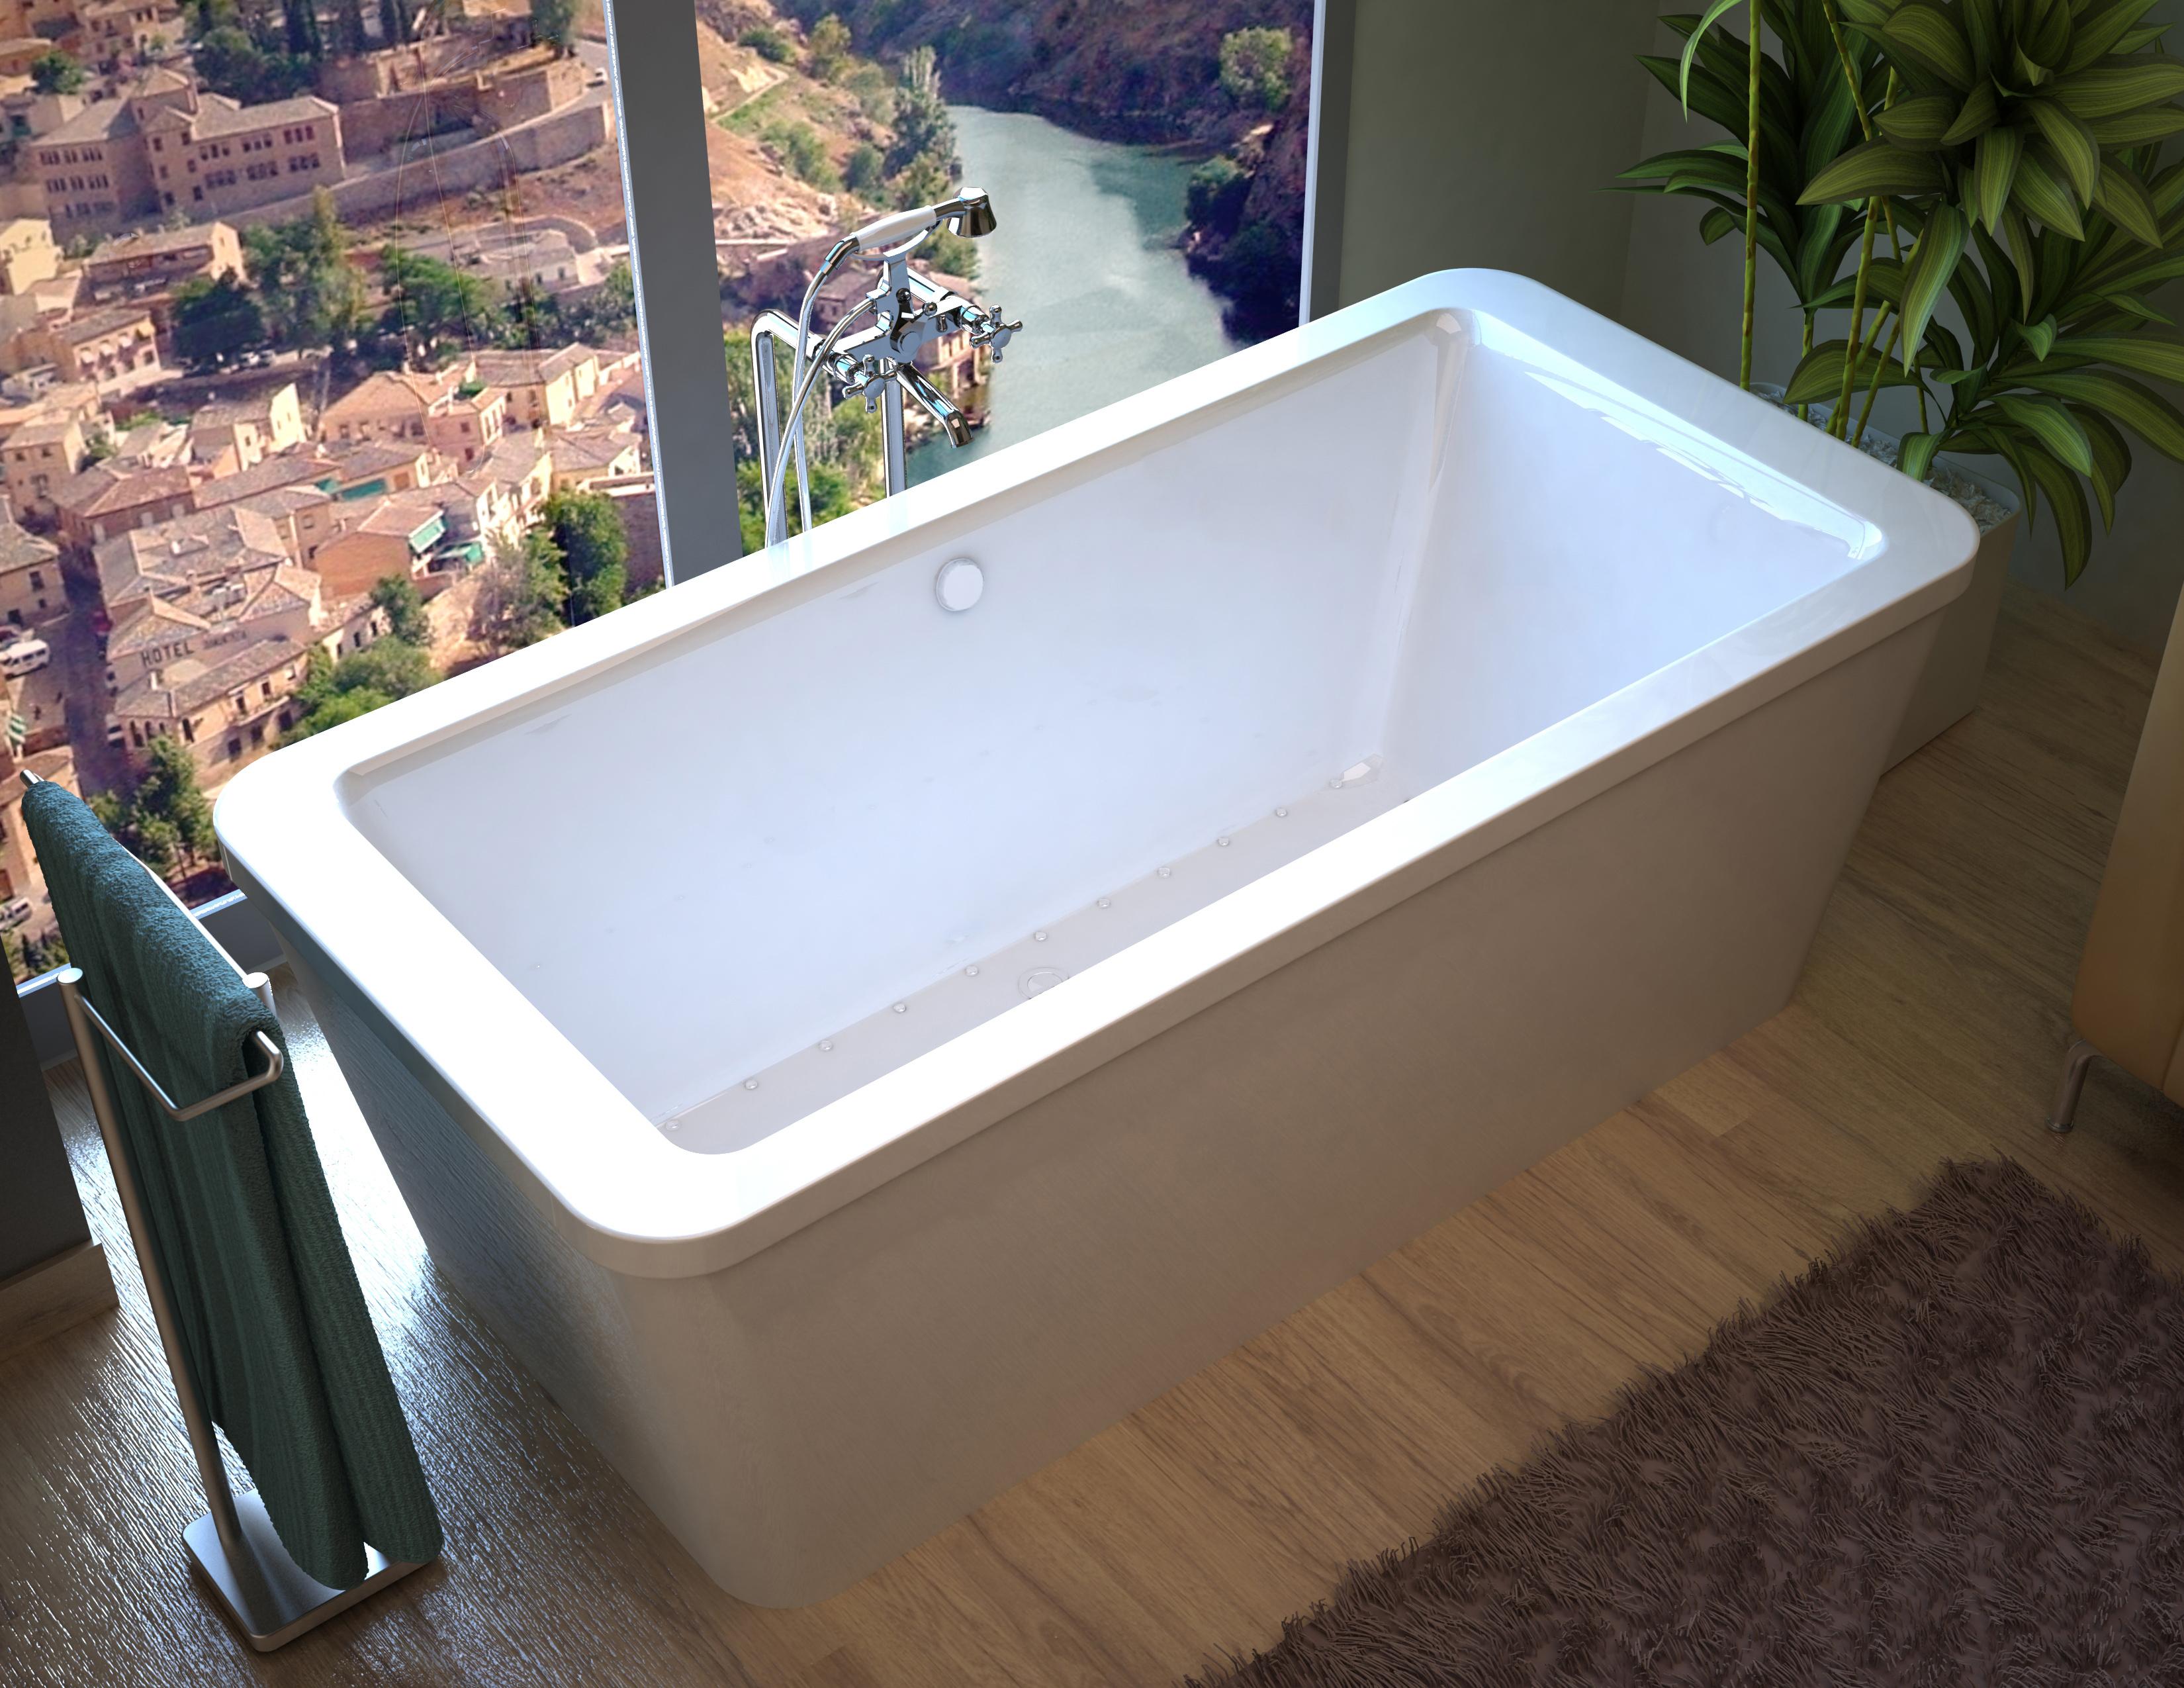 Aquilia 34 x 67 x 22 in. Rectangular Freestanding Air Jetted Bathtub